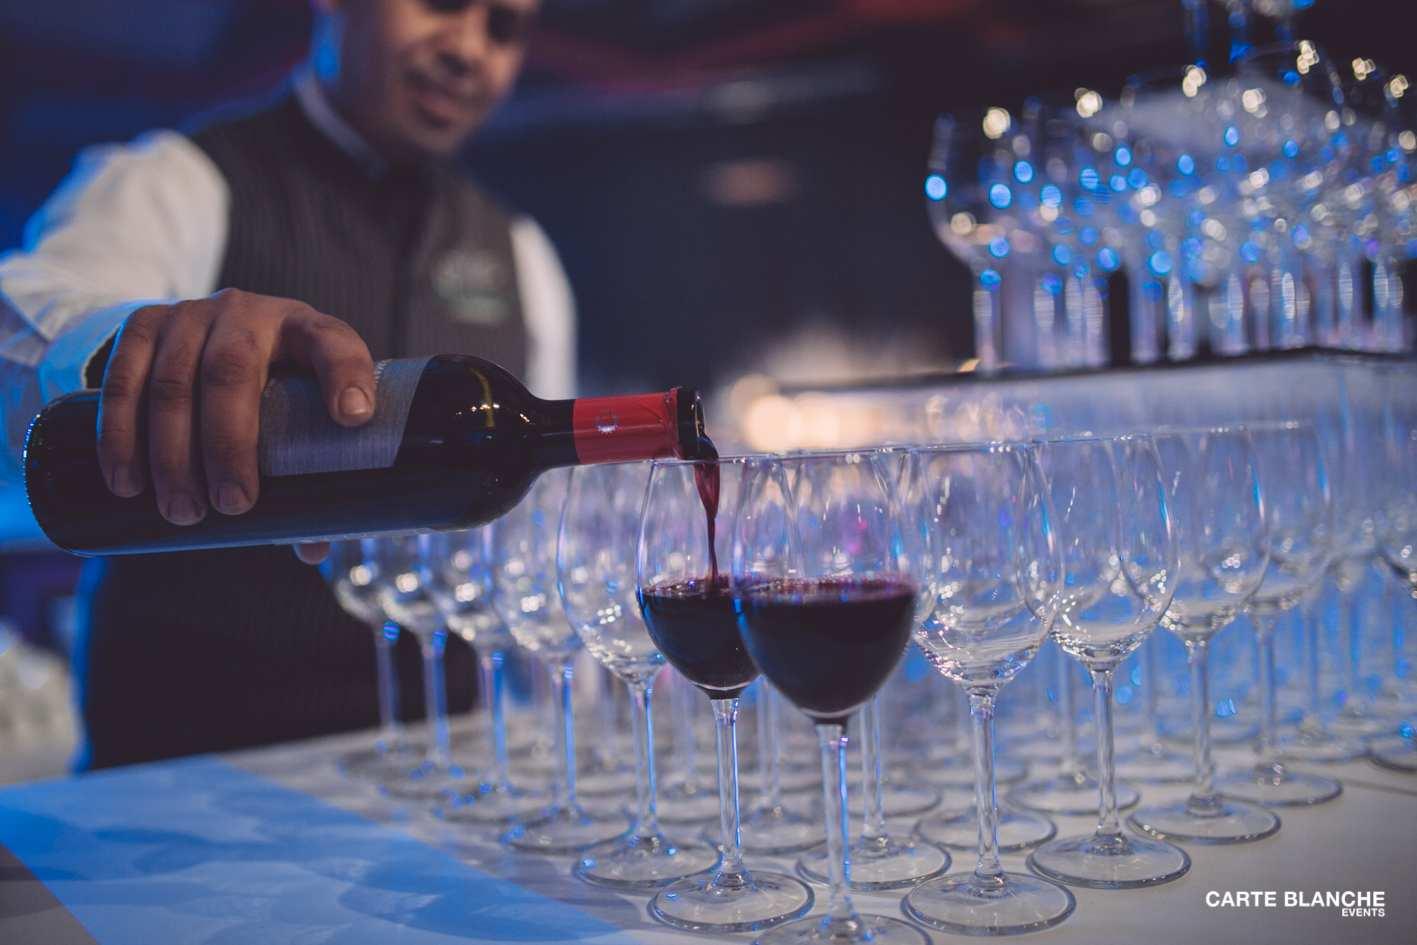 xmas-party-ferrero-2013-boissons-vin-carte-blanche